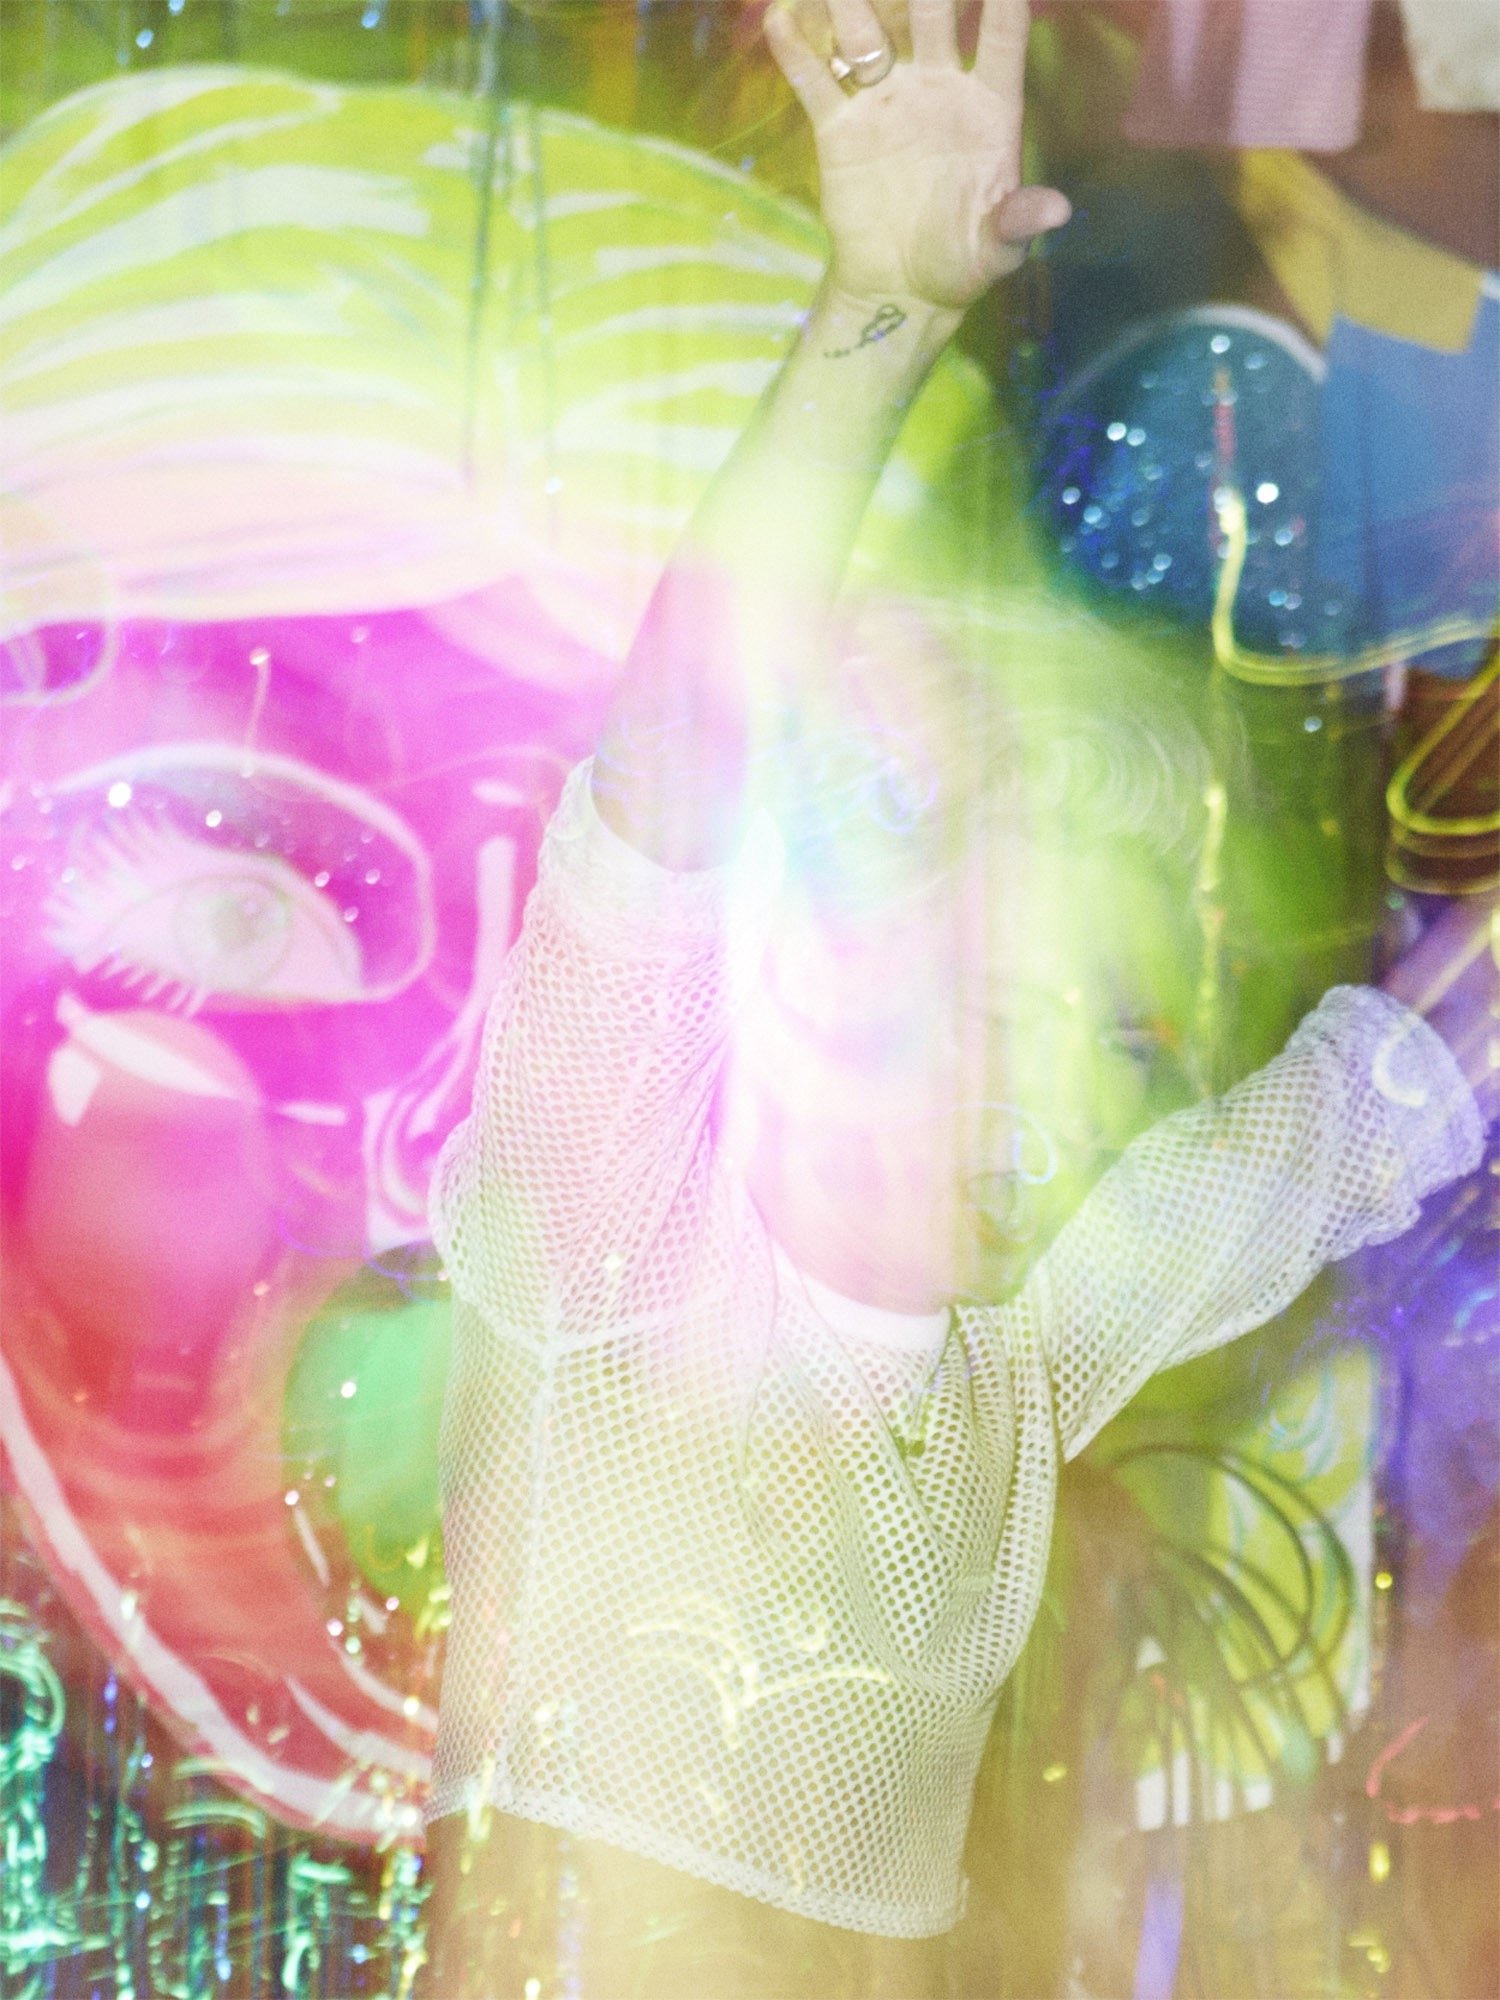 Ponystep 00123_F1_RGB.jpg